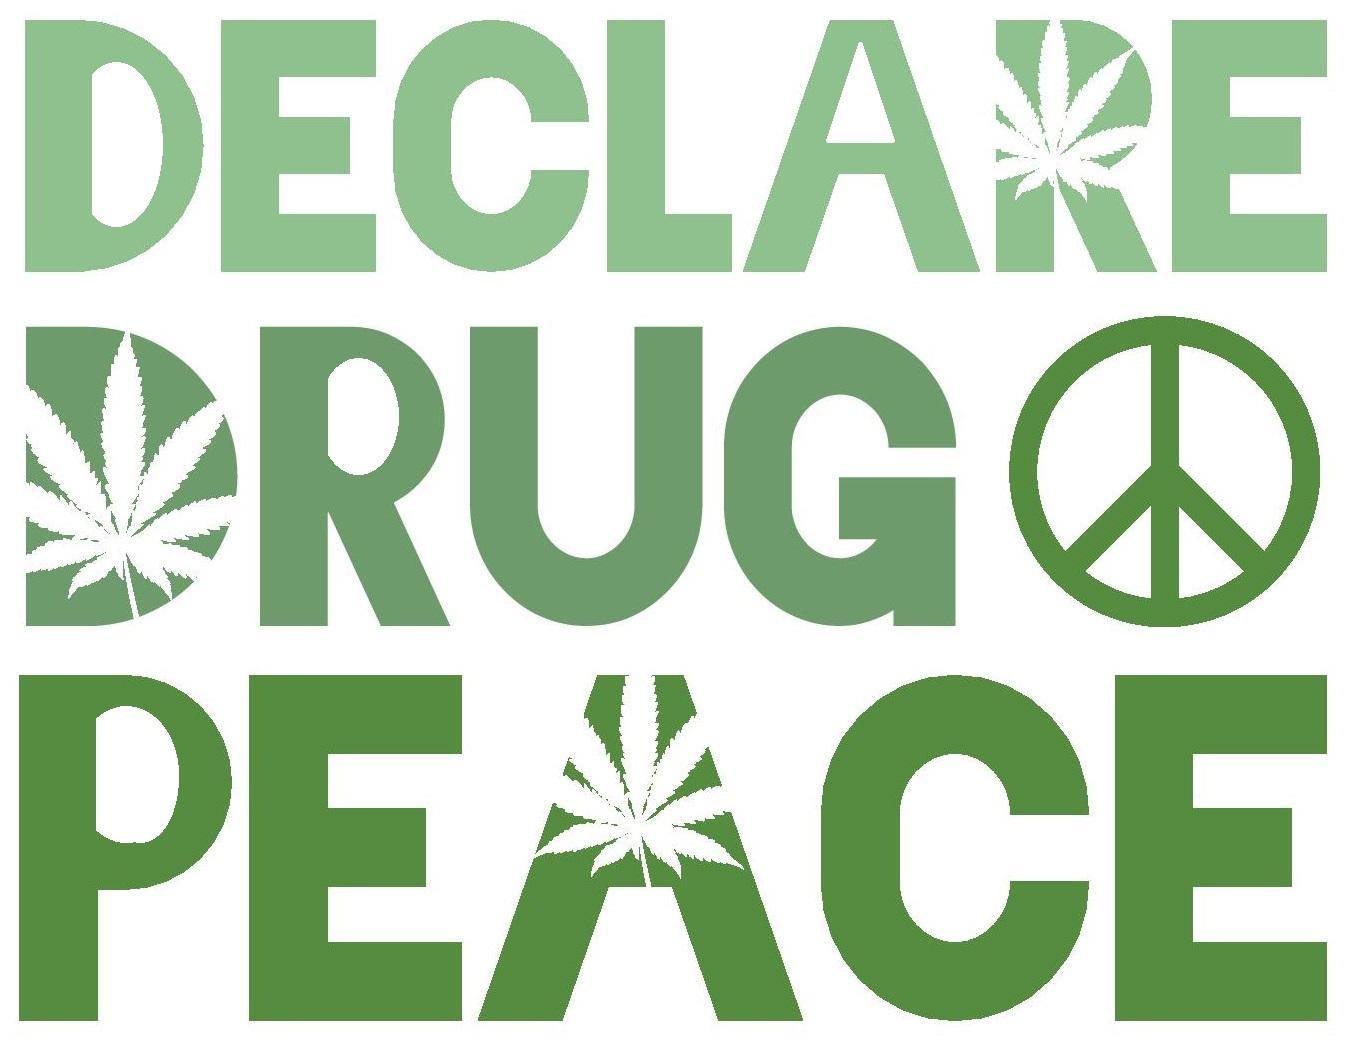 MMJ plac declare drug peace